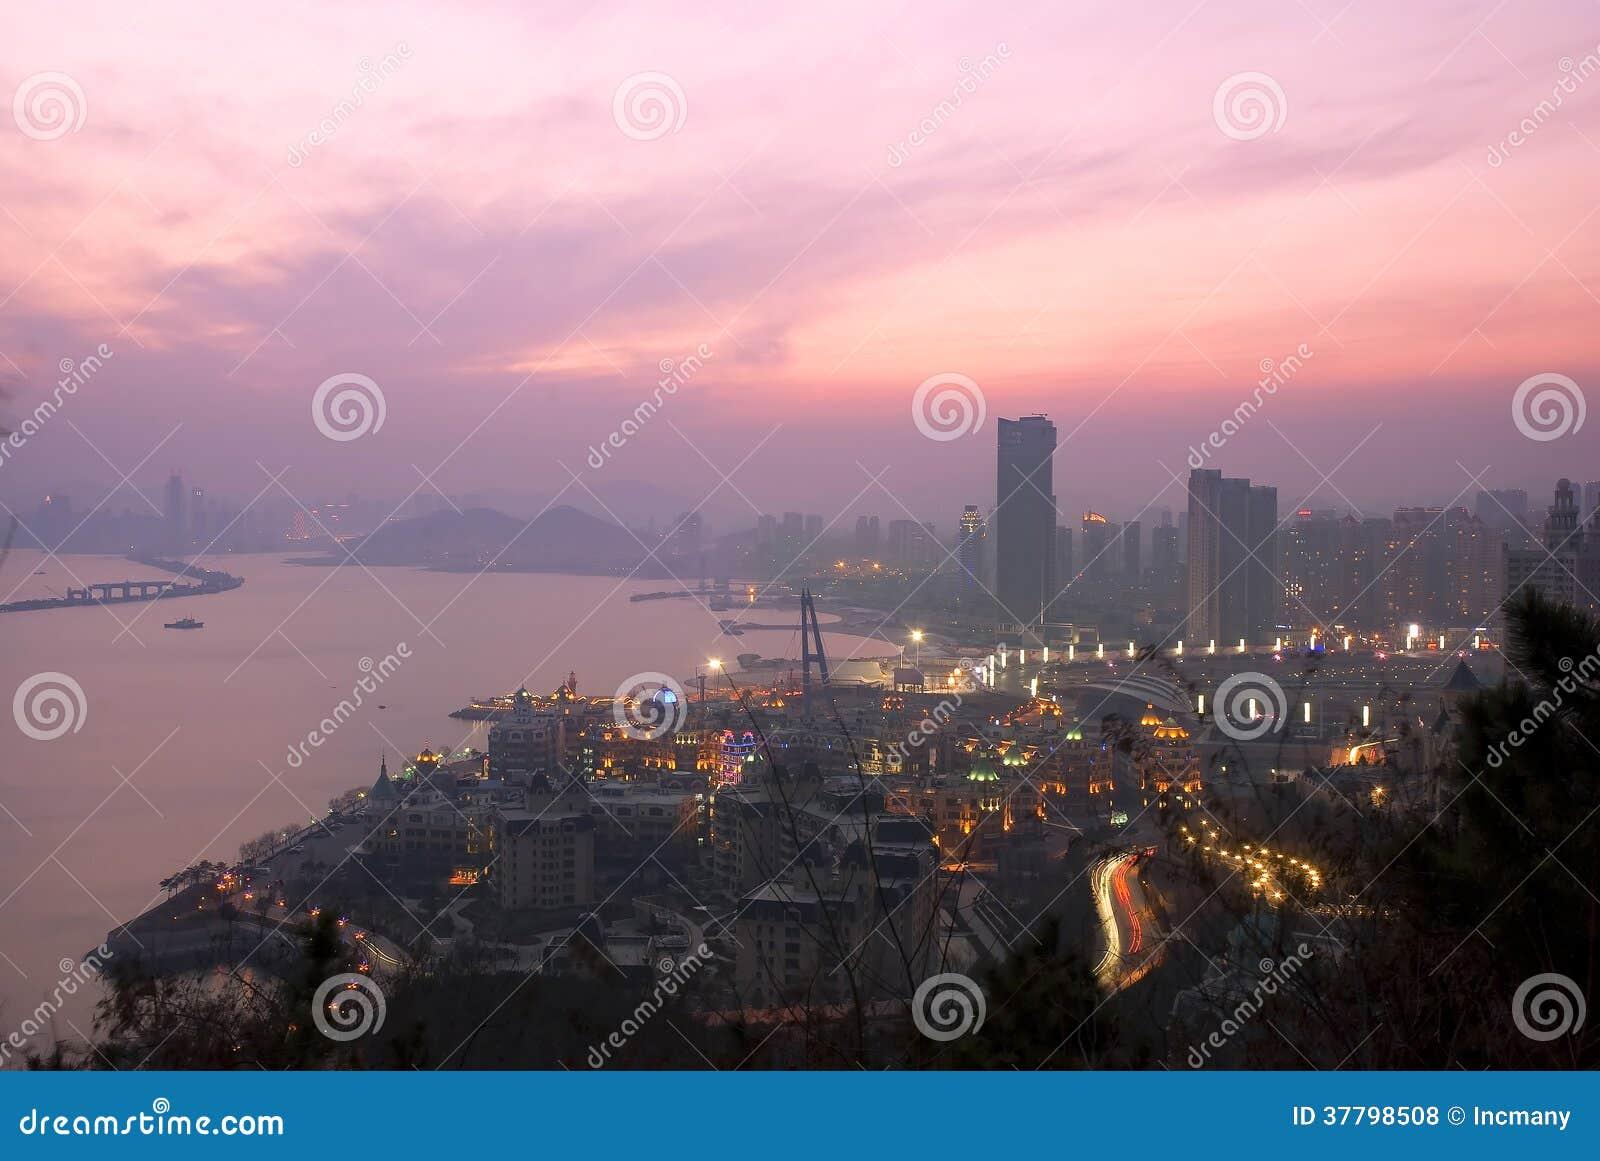 Download Moden city night scenes stock photo. Image of urban, architecture - 37798508